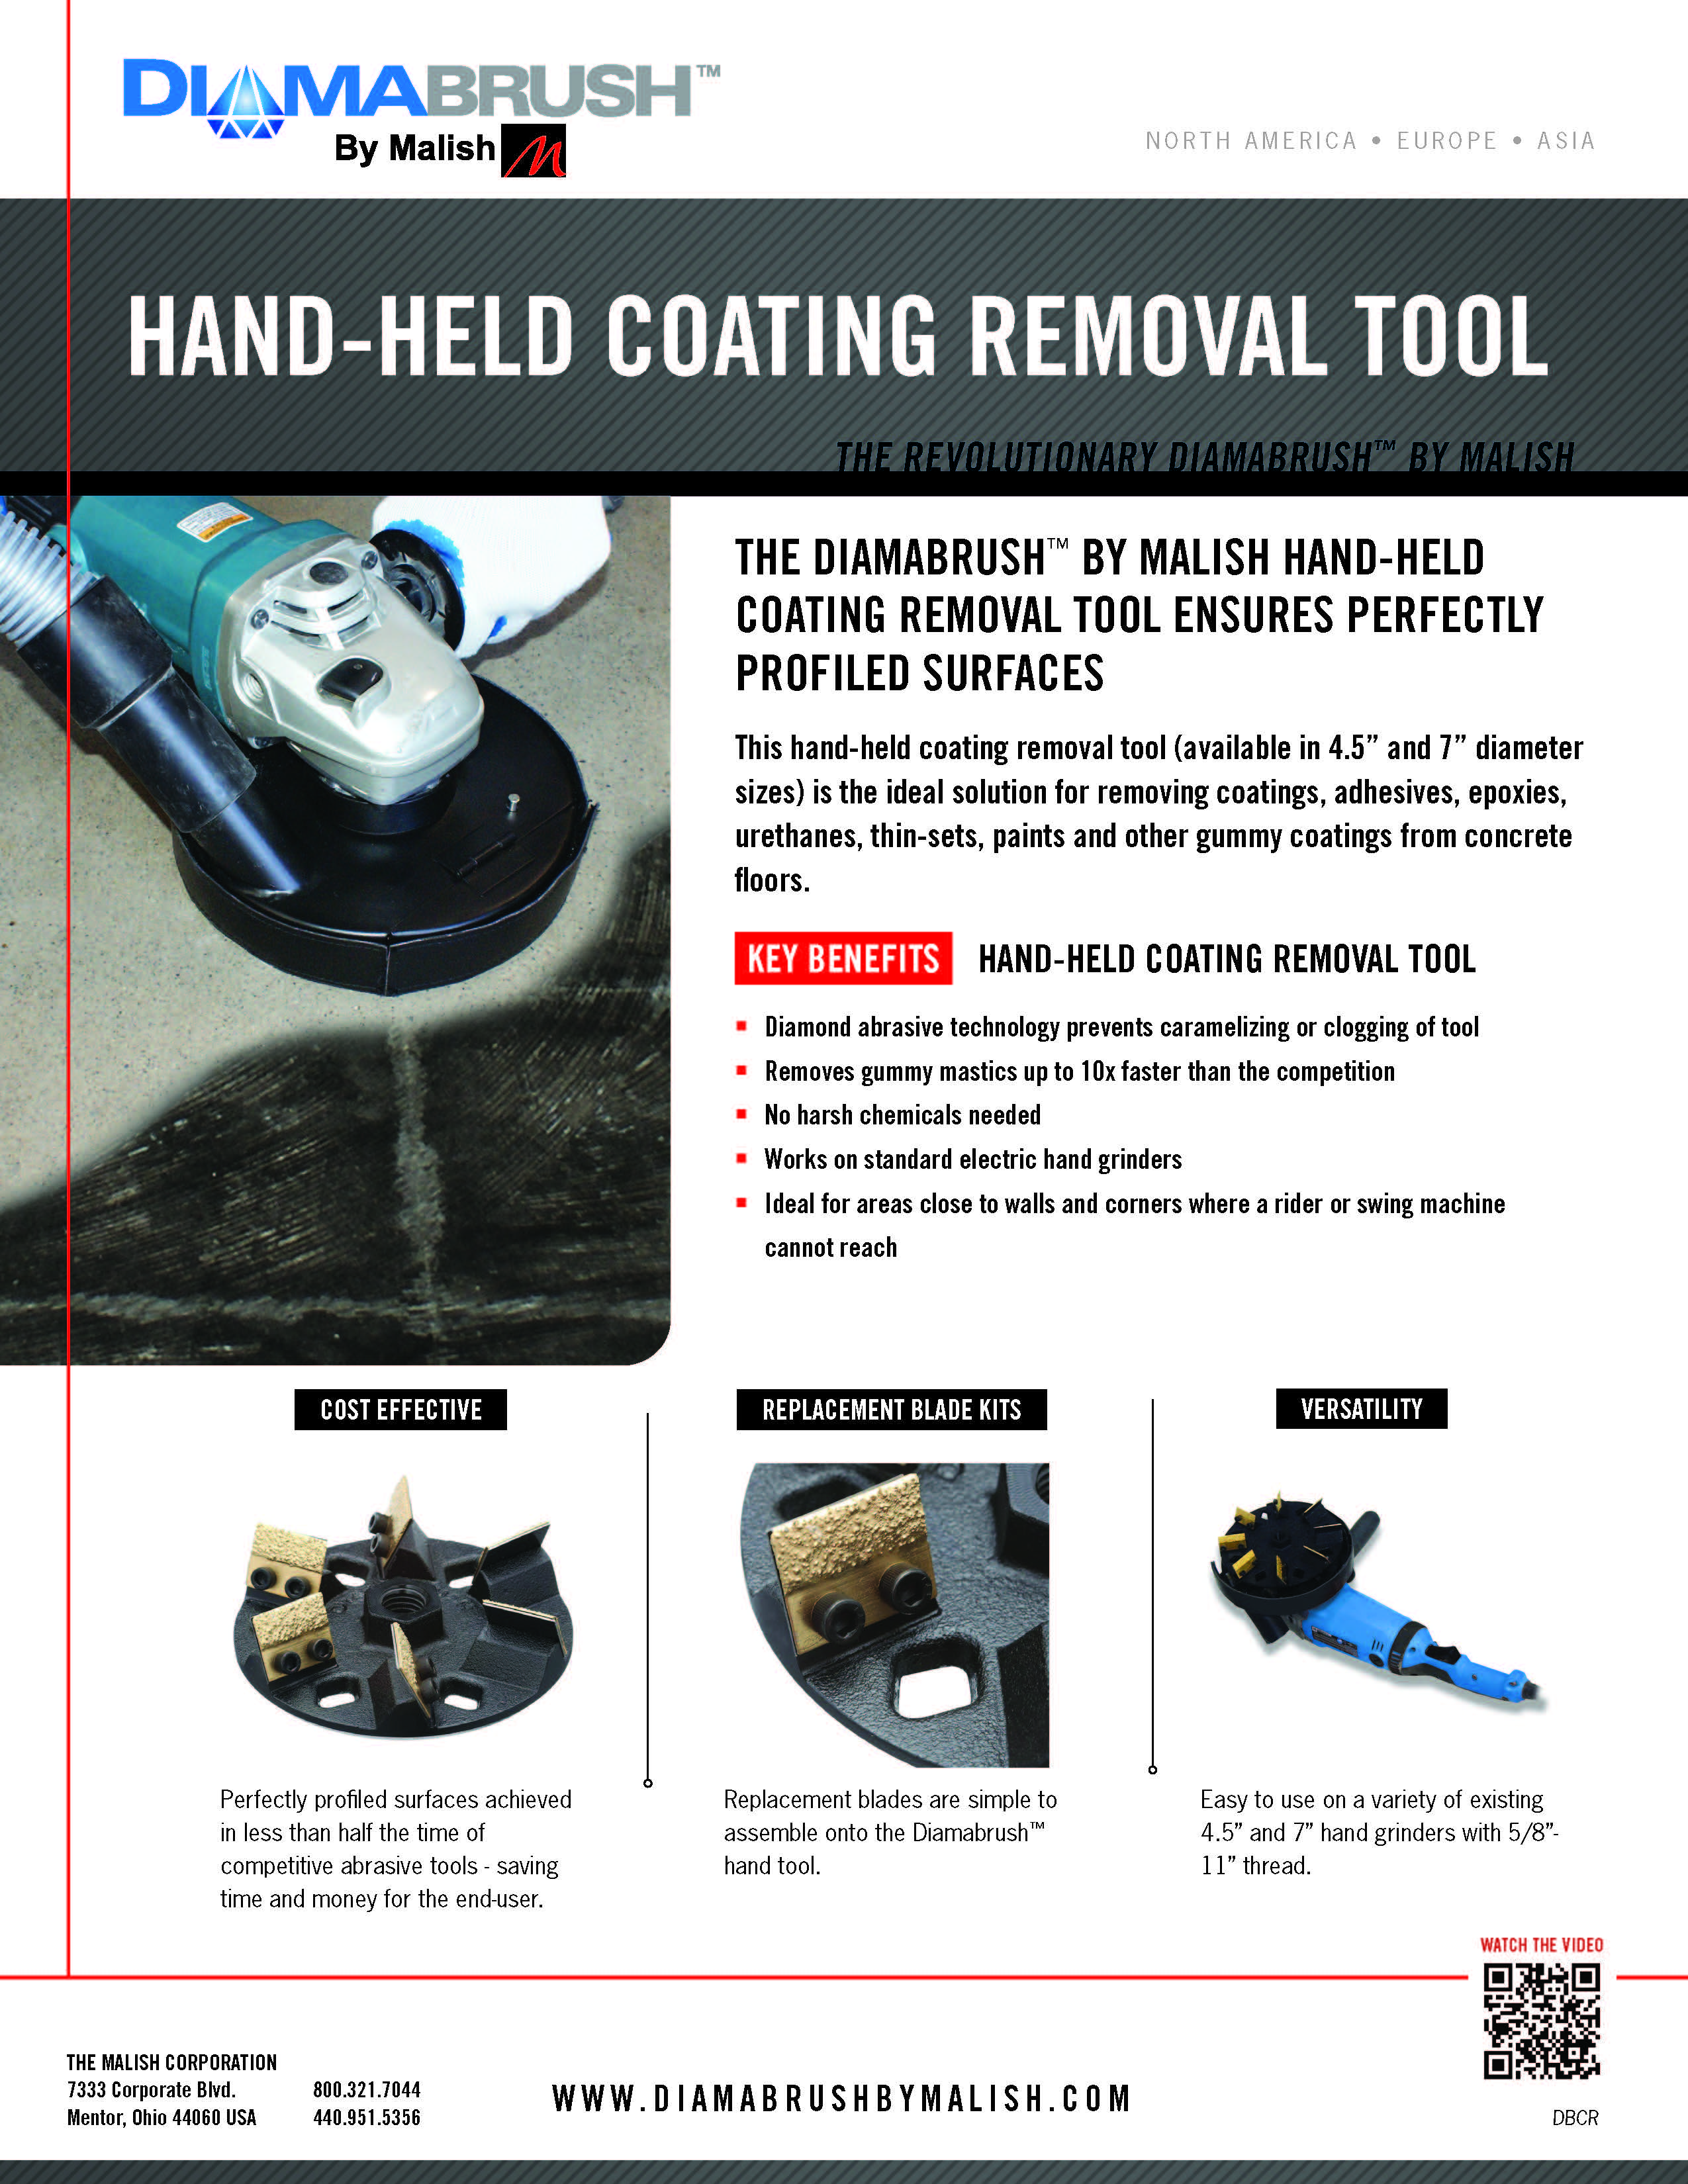 Handheld Coating Removal Tool